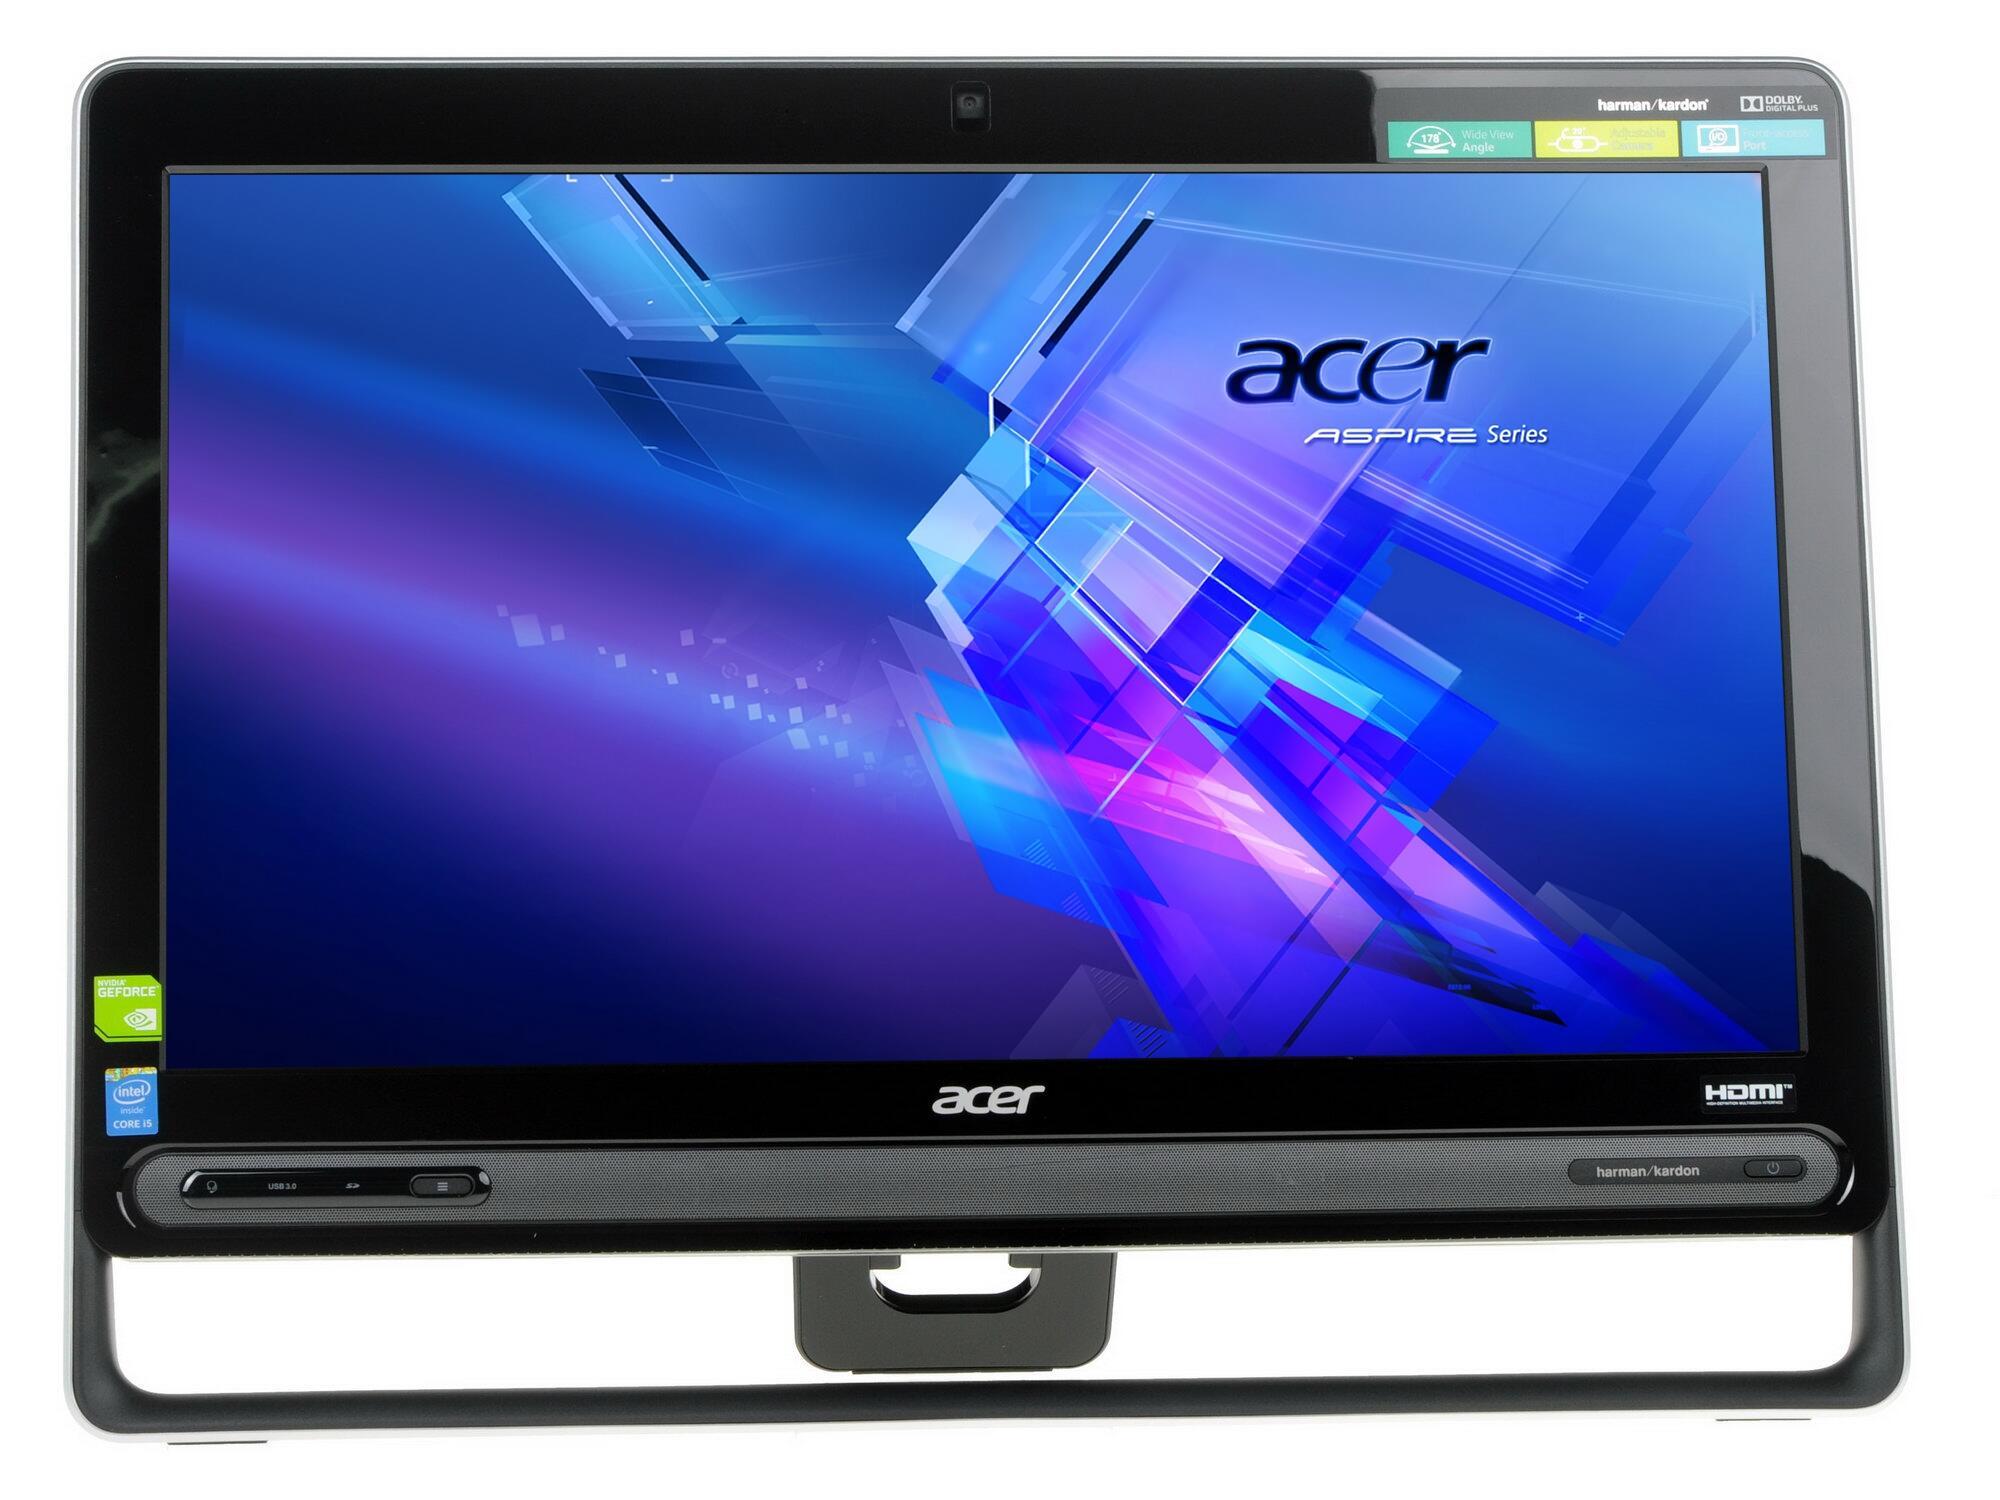 Моноблок Acer Aspire C22-860 (DQ.BAVER.001) Pentium-4405U (2.4)/4GB/500GB/21.5